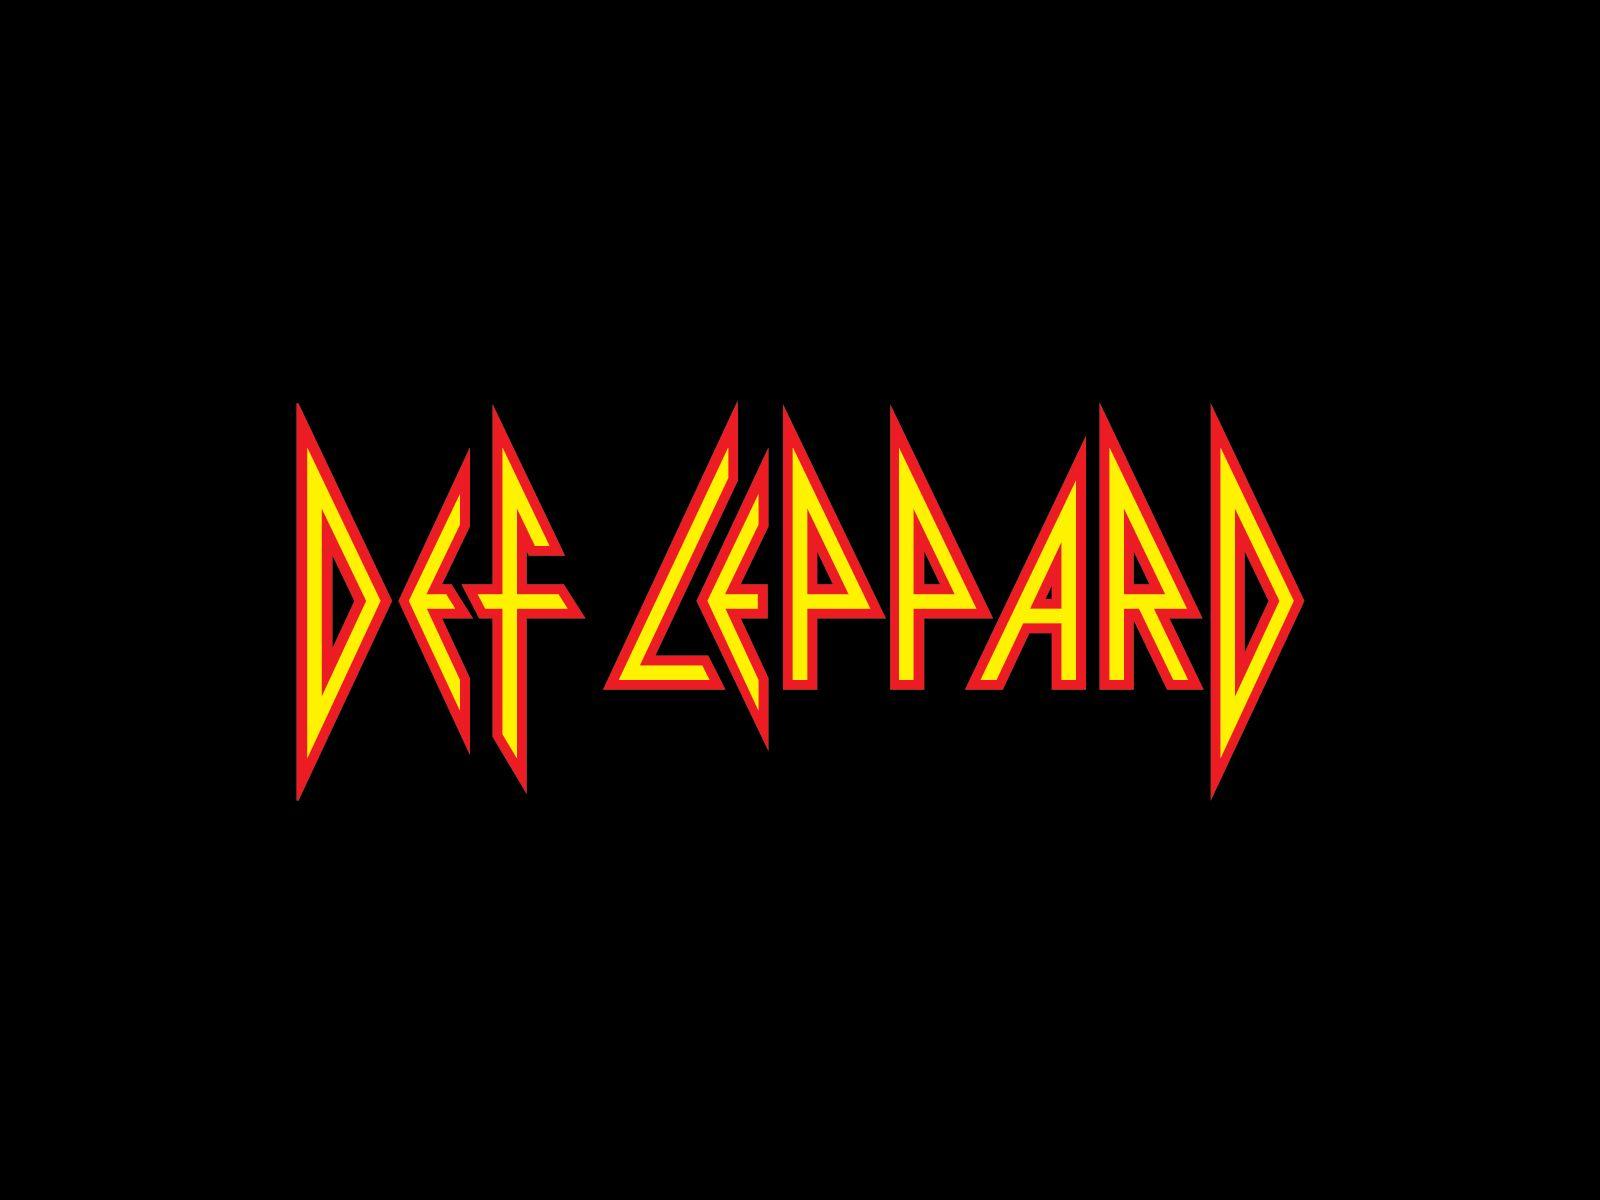 Def Leppard Logo Rock Band Logos Metal Band Logos Def Leppard